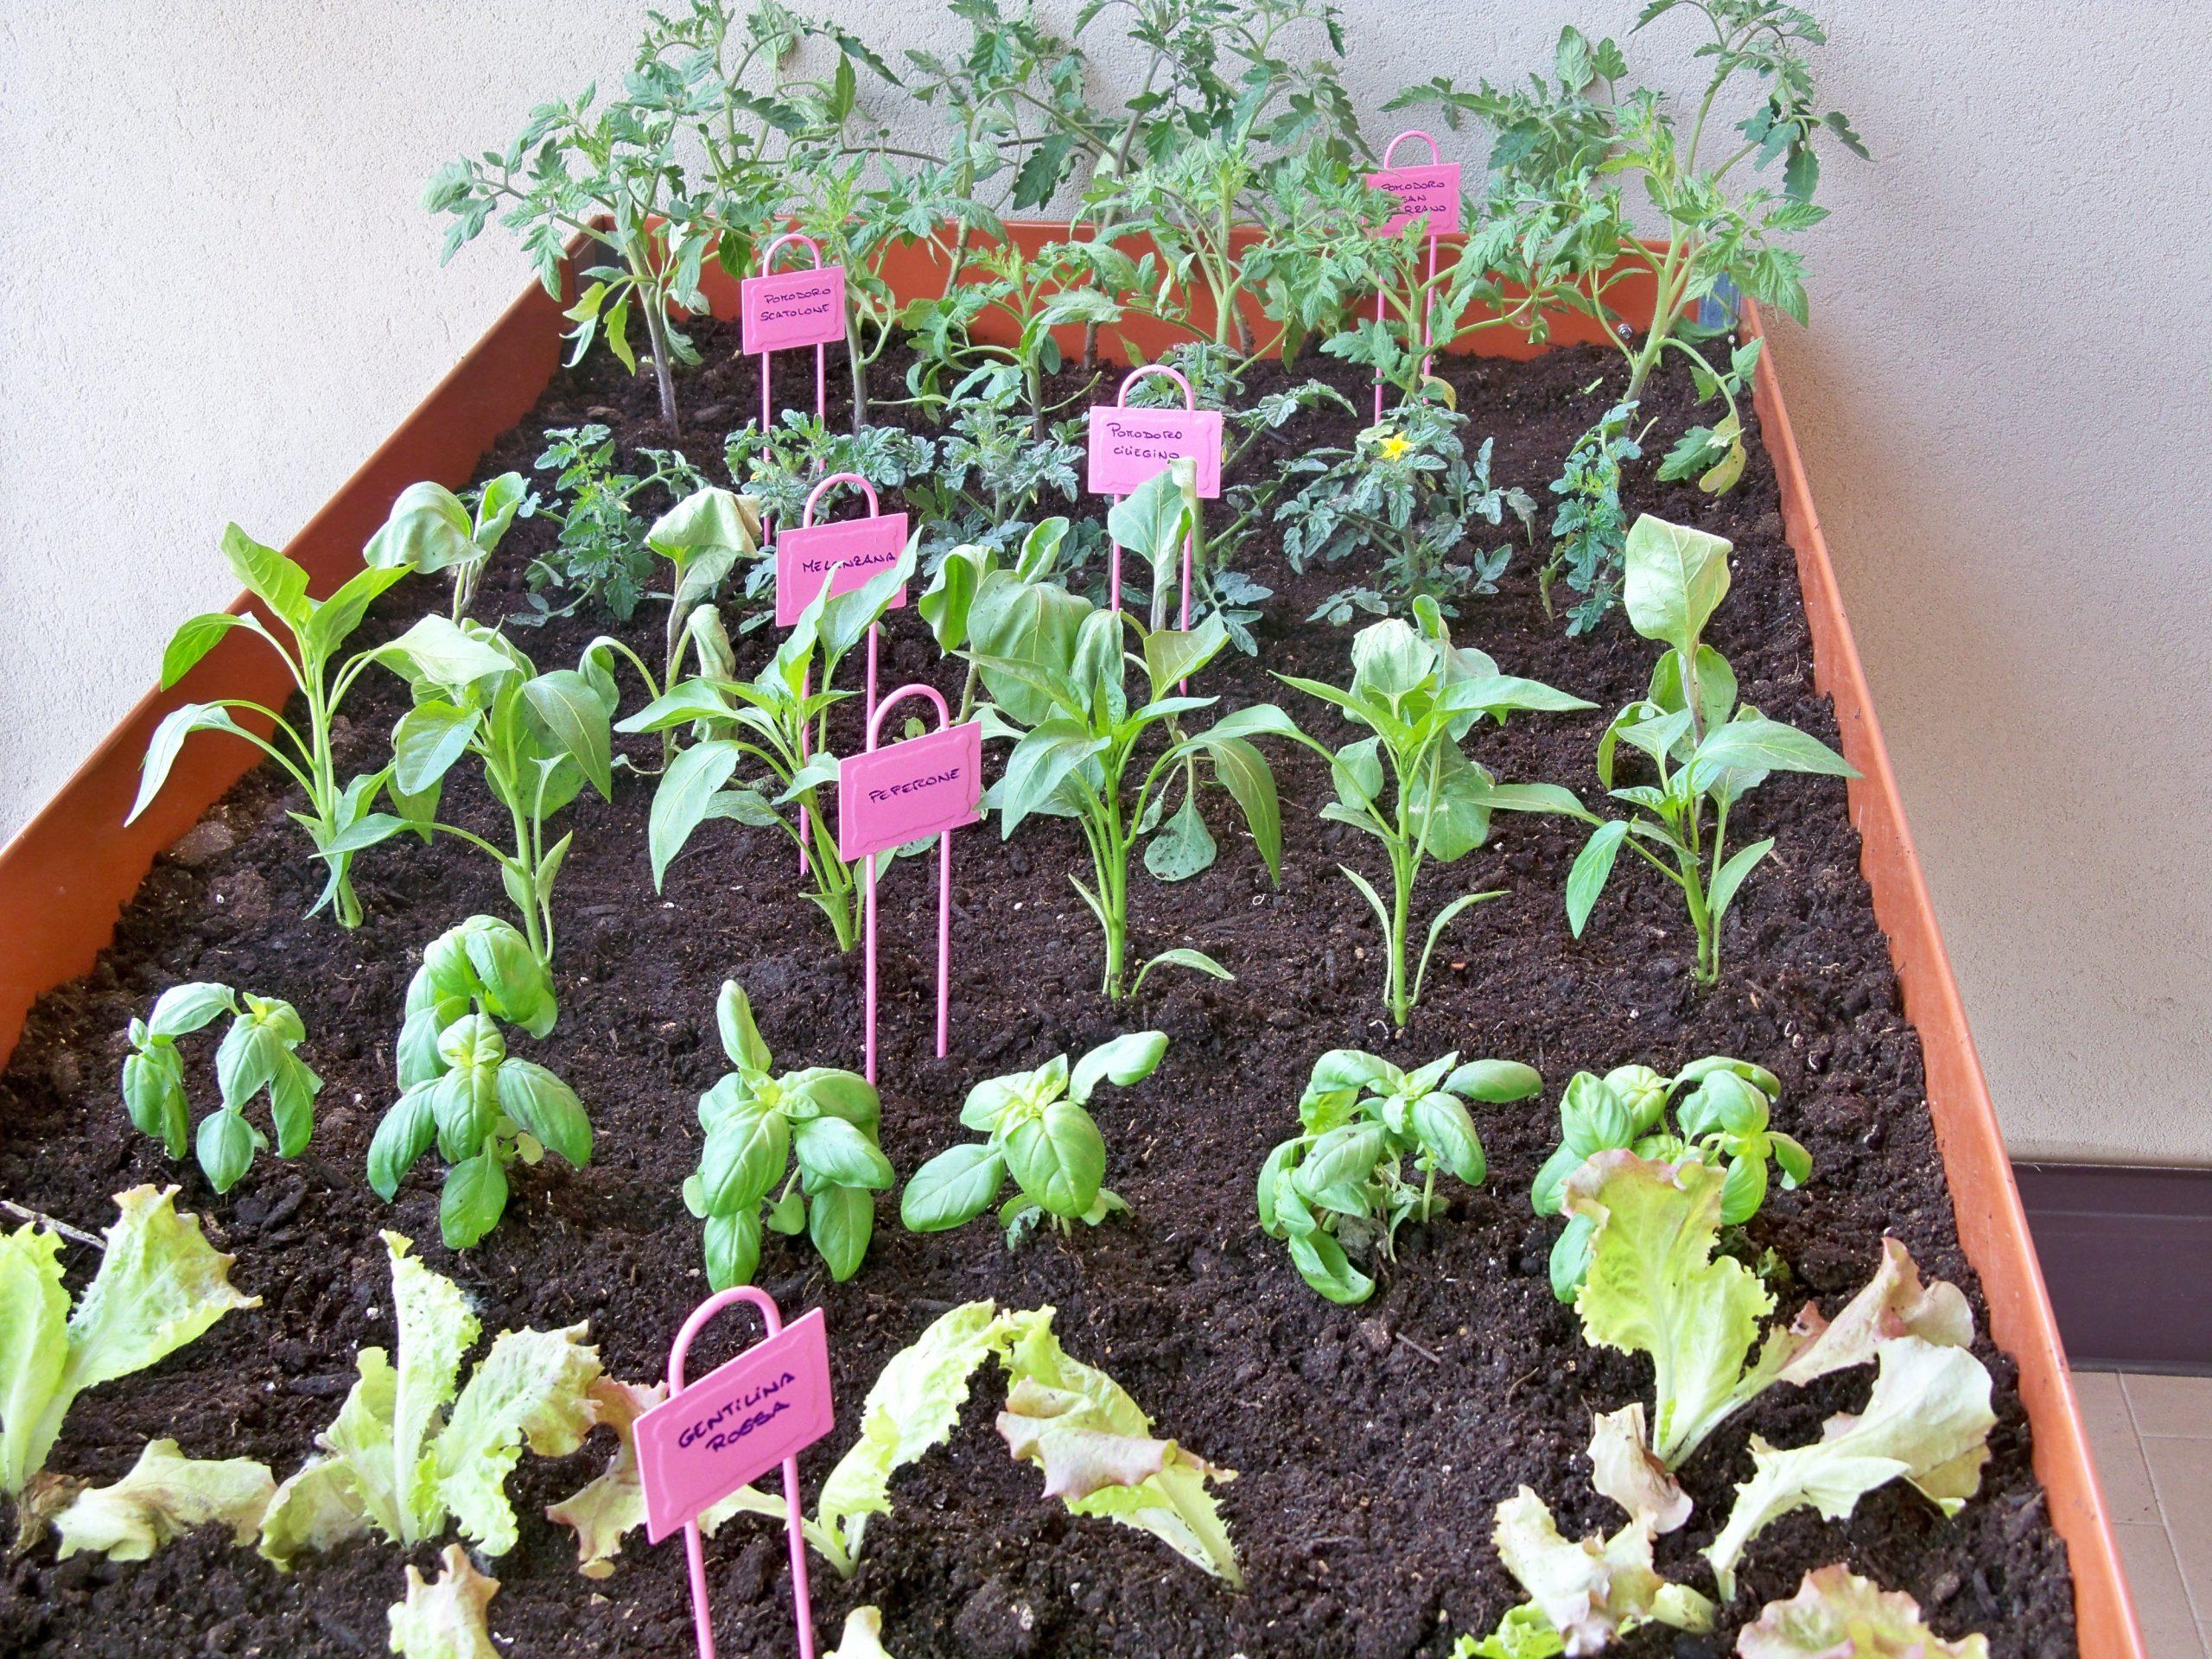 Ortoterapia e orto sul balcone: insalate, basilico, peperoni, peperoncini, pomodori